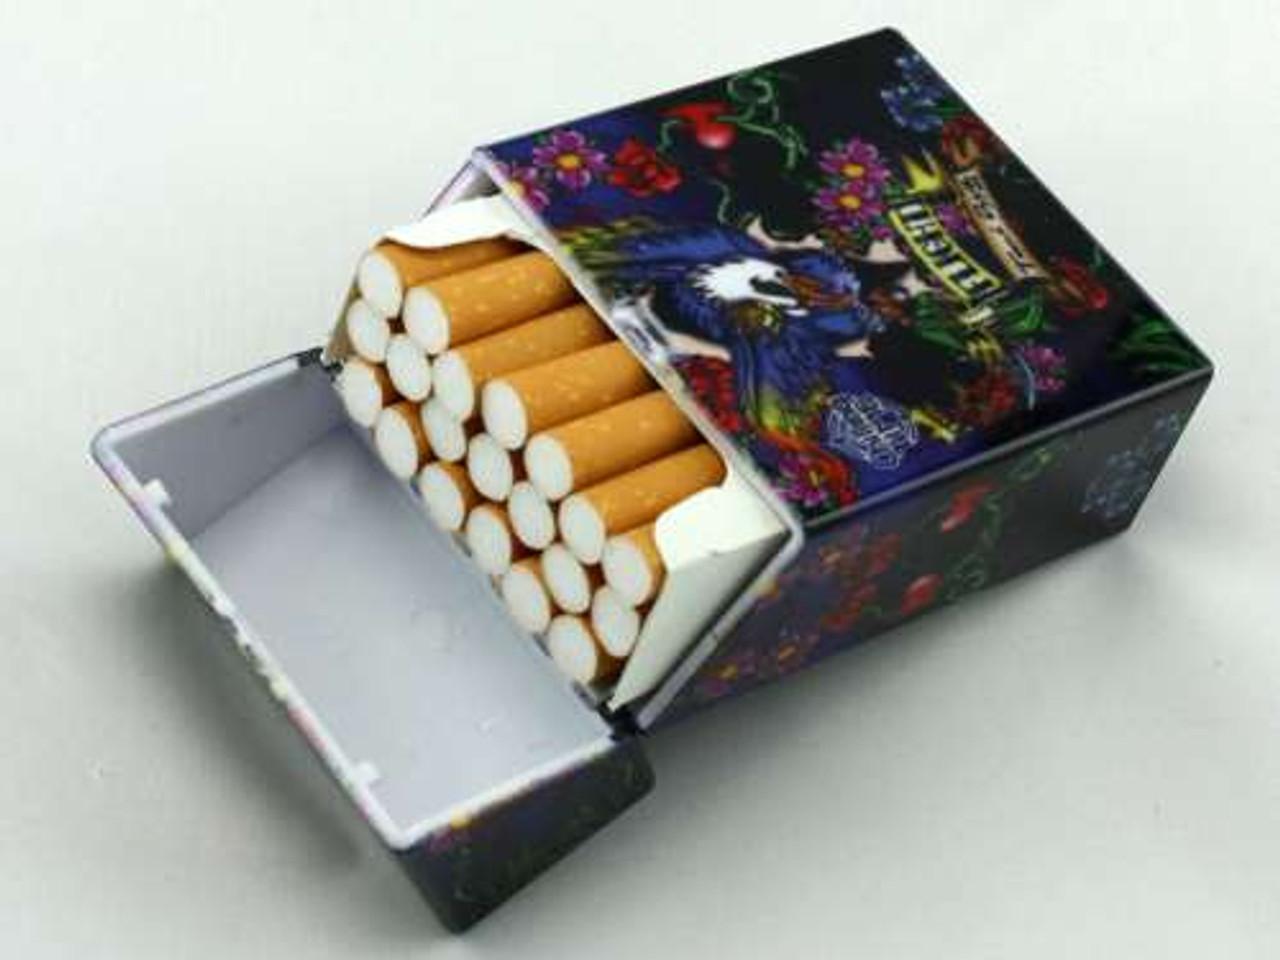 Wild Tattoo Cigarette Pack Holder